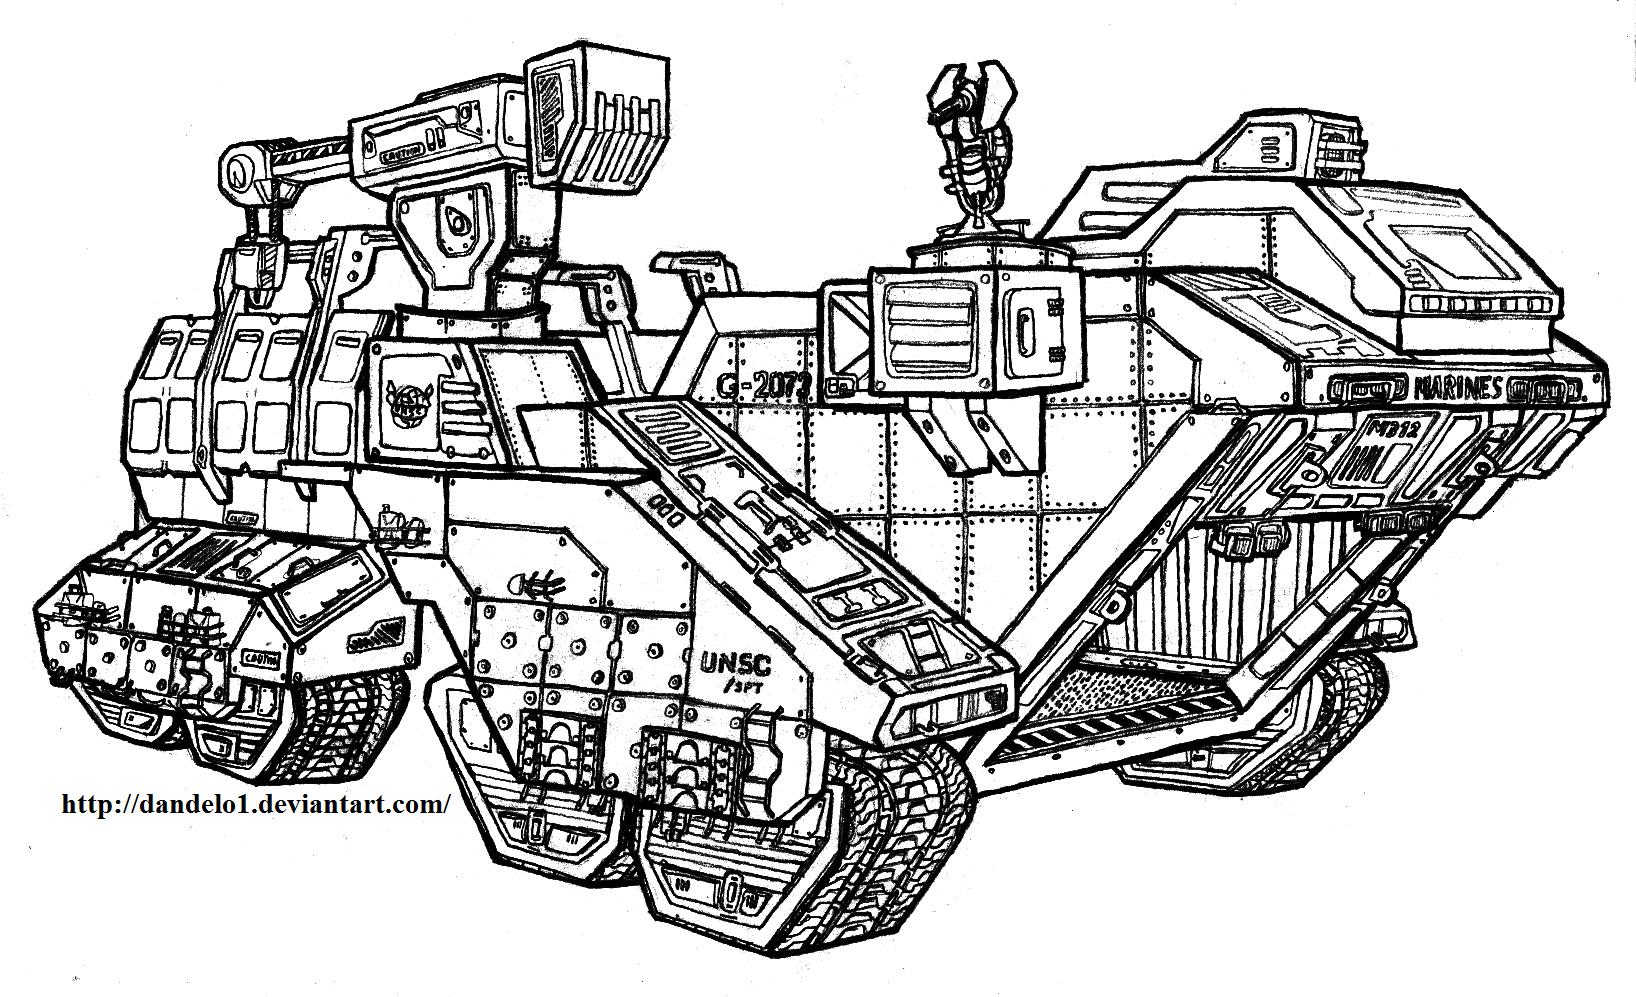 M313 Heavy Recovery Vehicle Elephant by Dandelo1 on DeviantArt